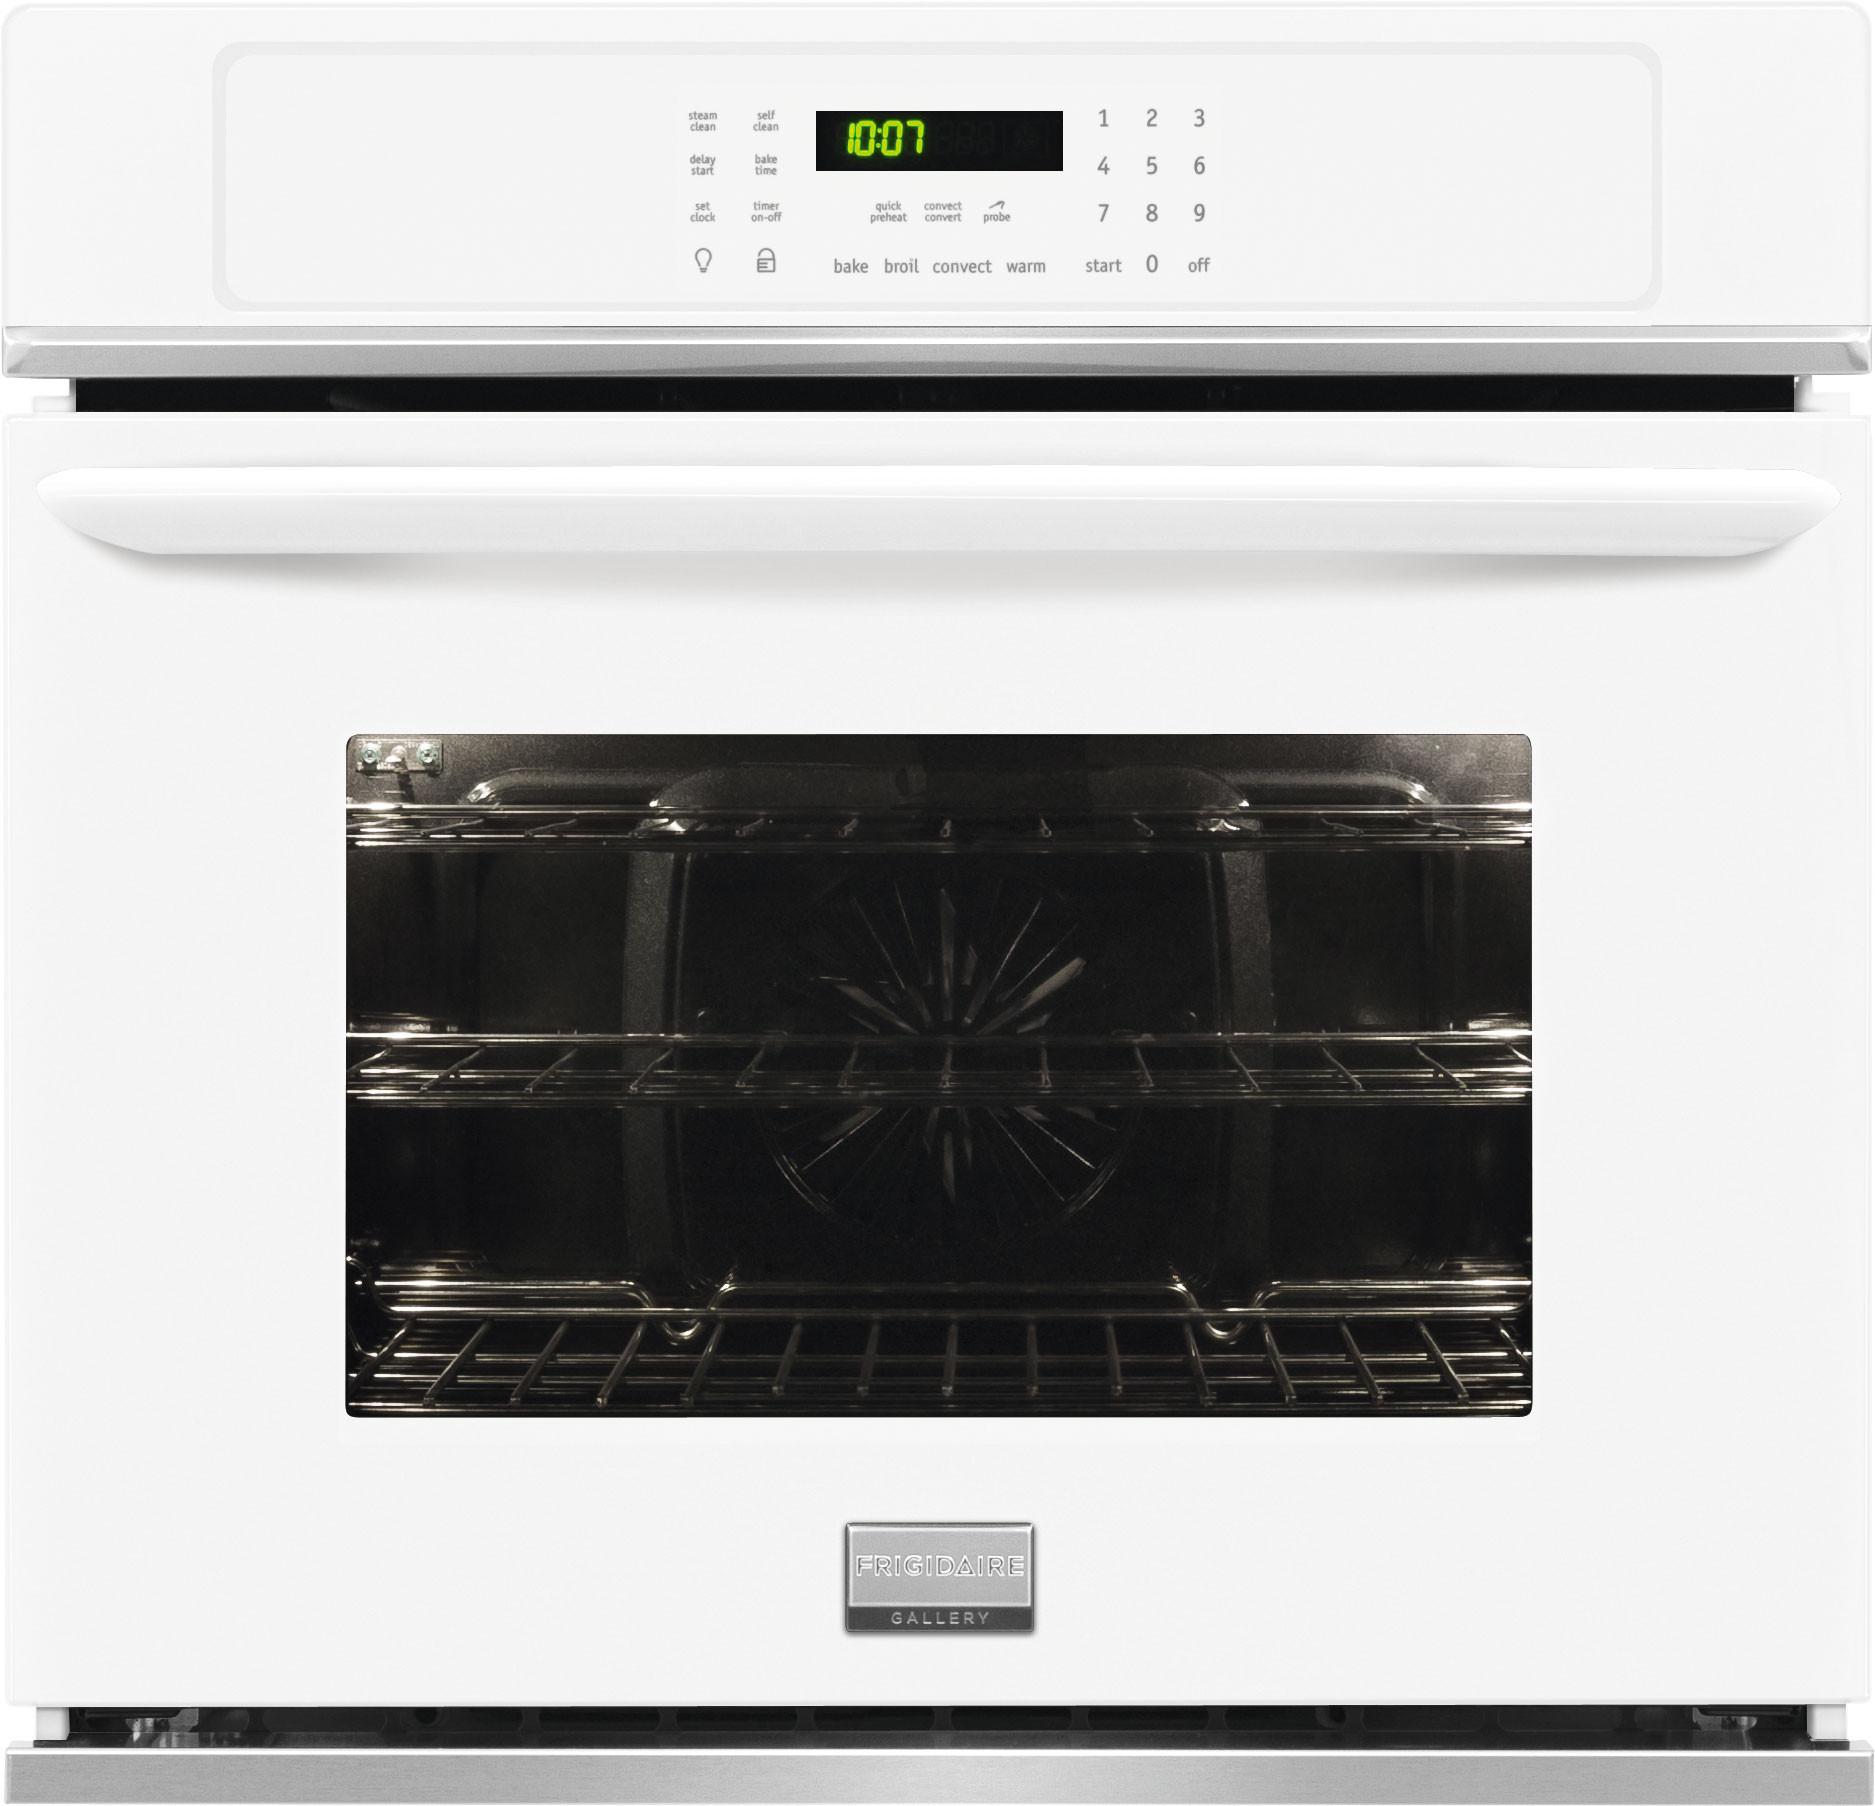 Wall oven under cooktop - Wall Oven Under Cooktop 46